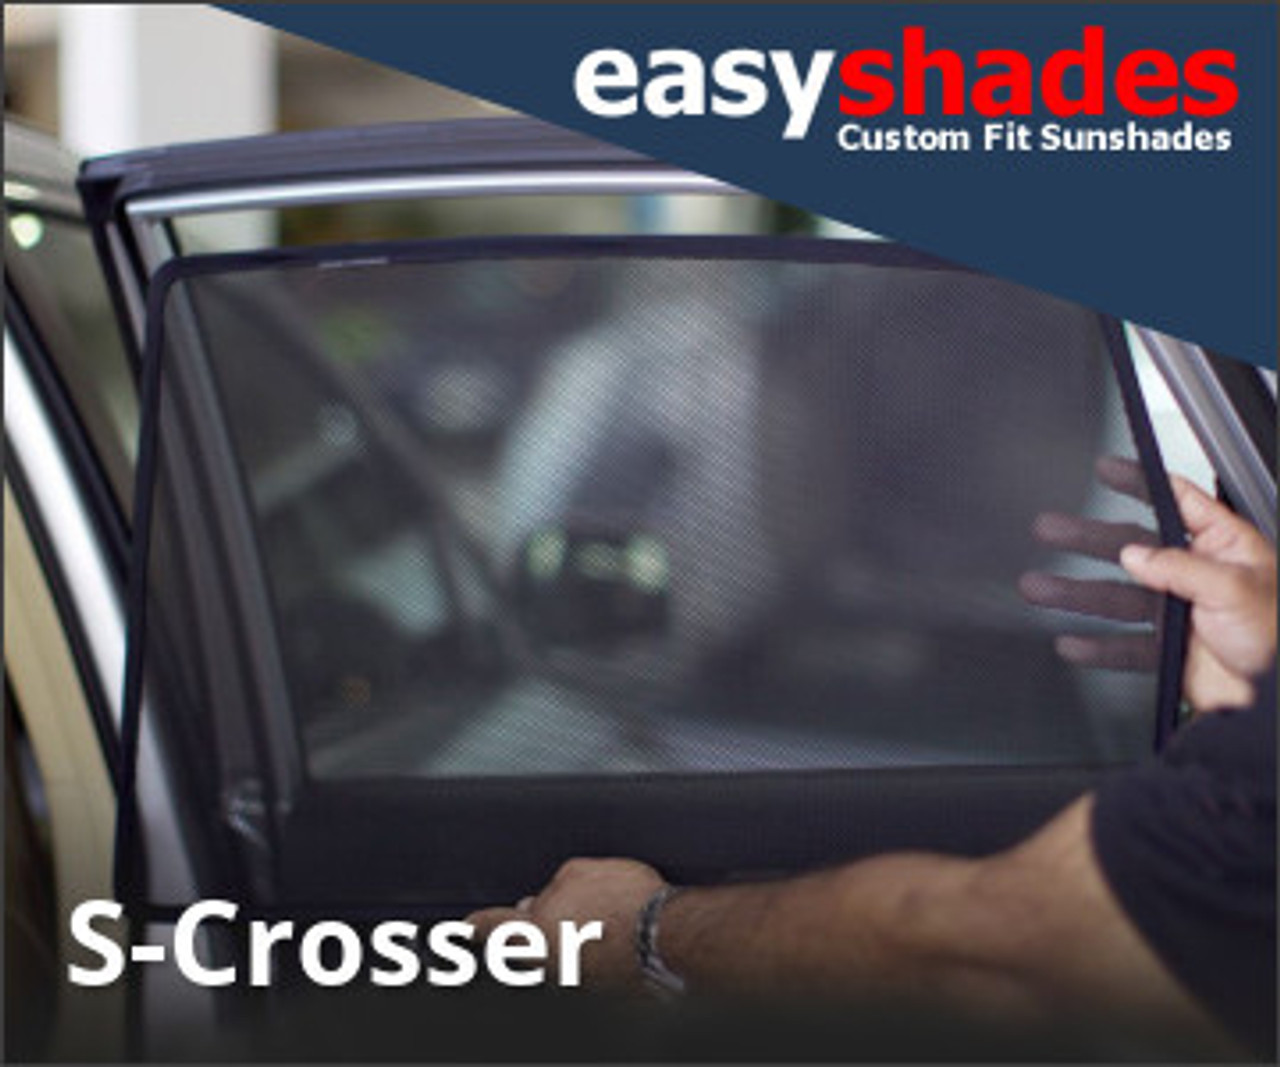 S-Crosser